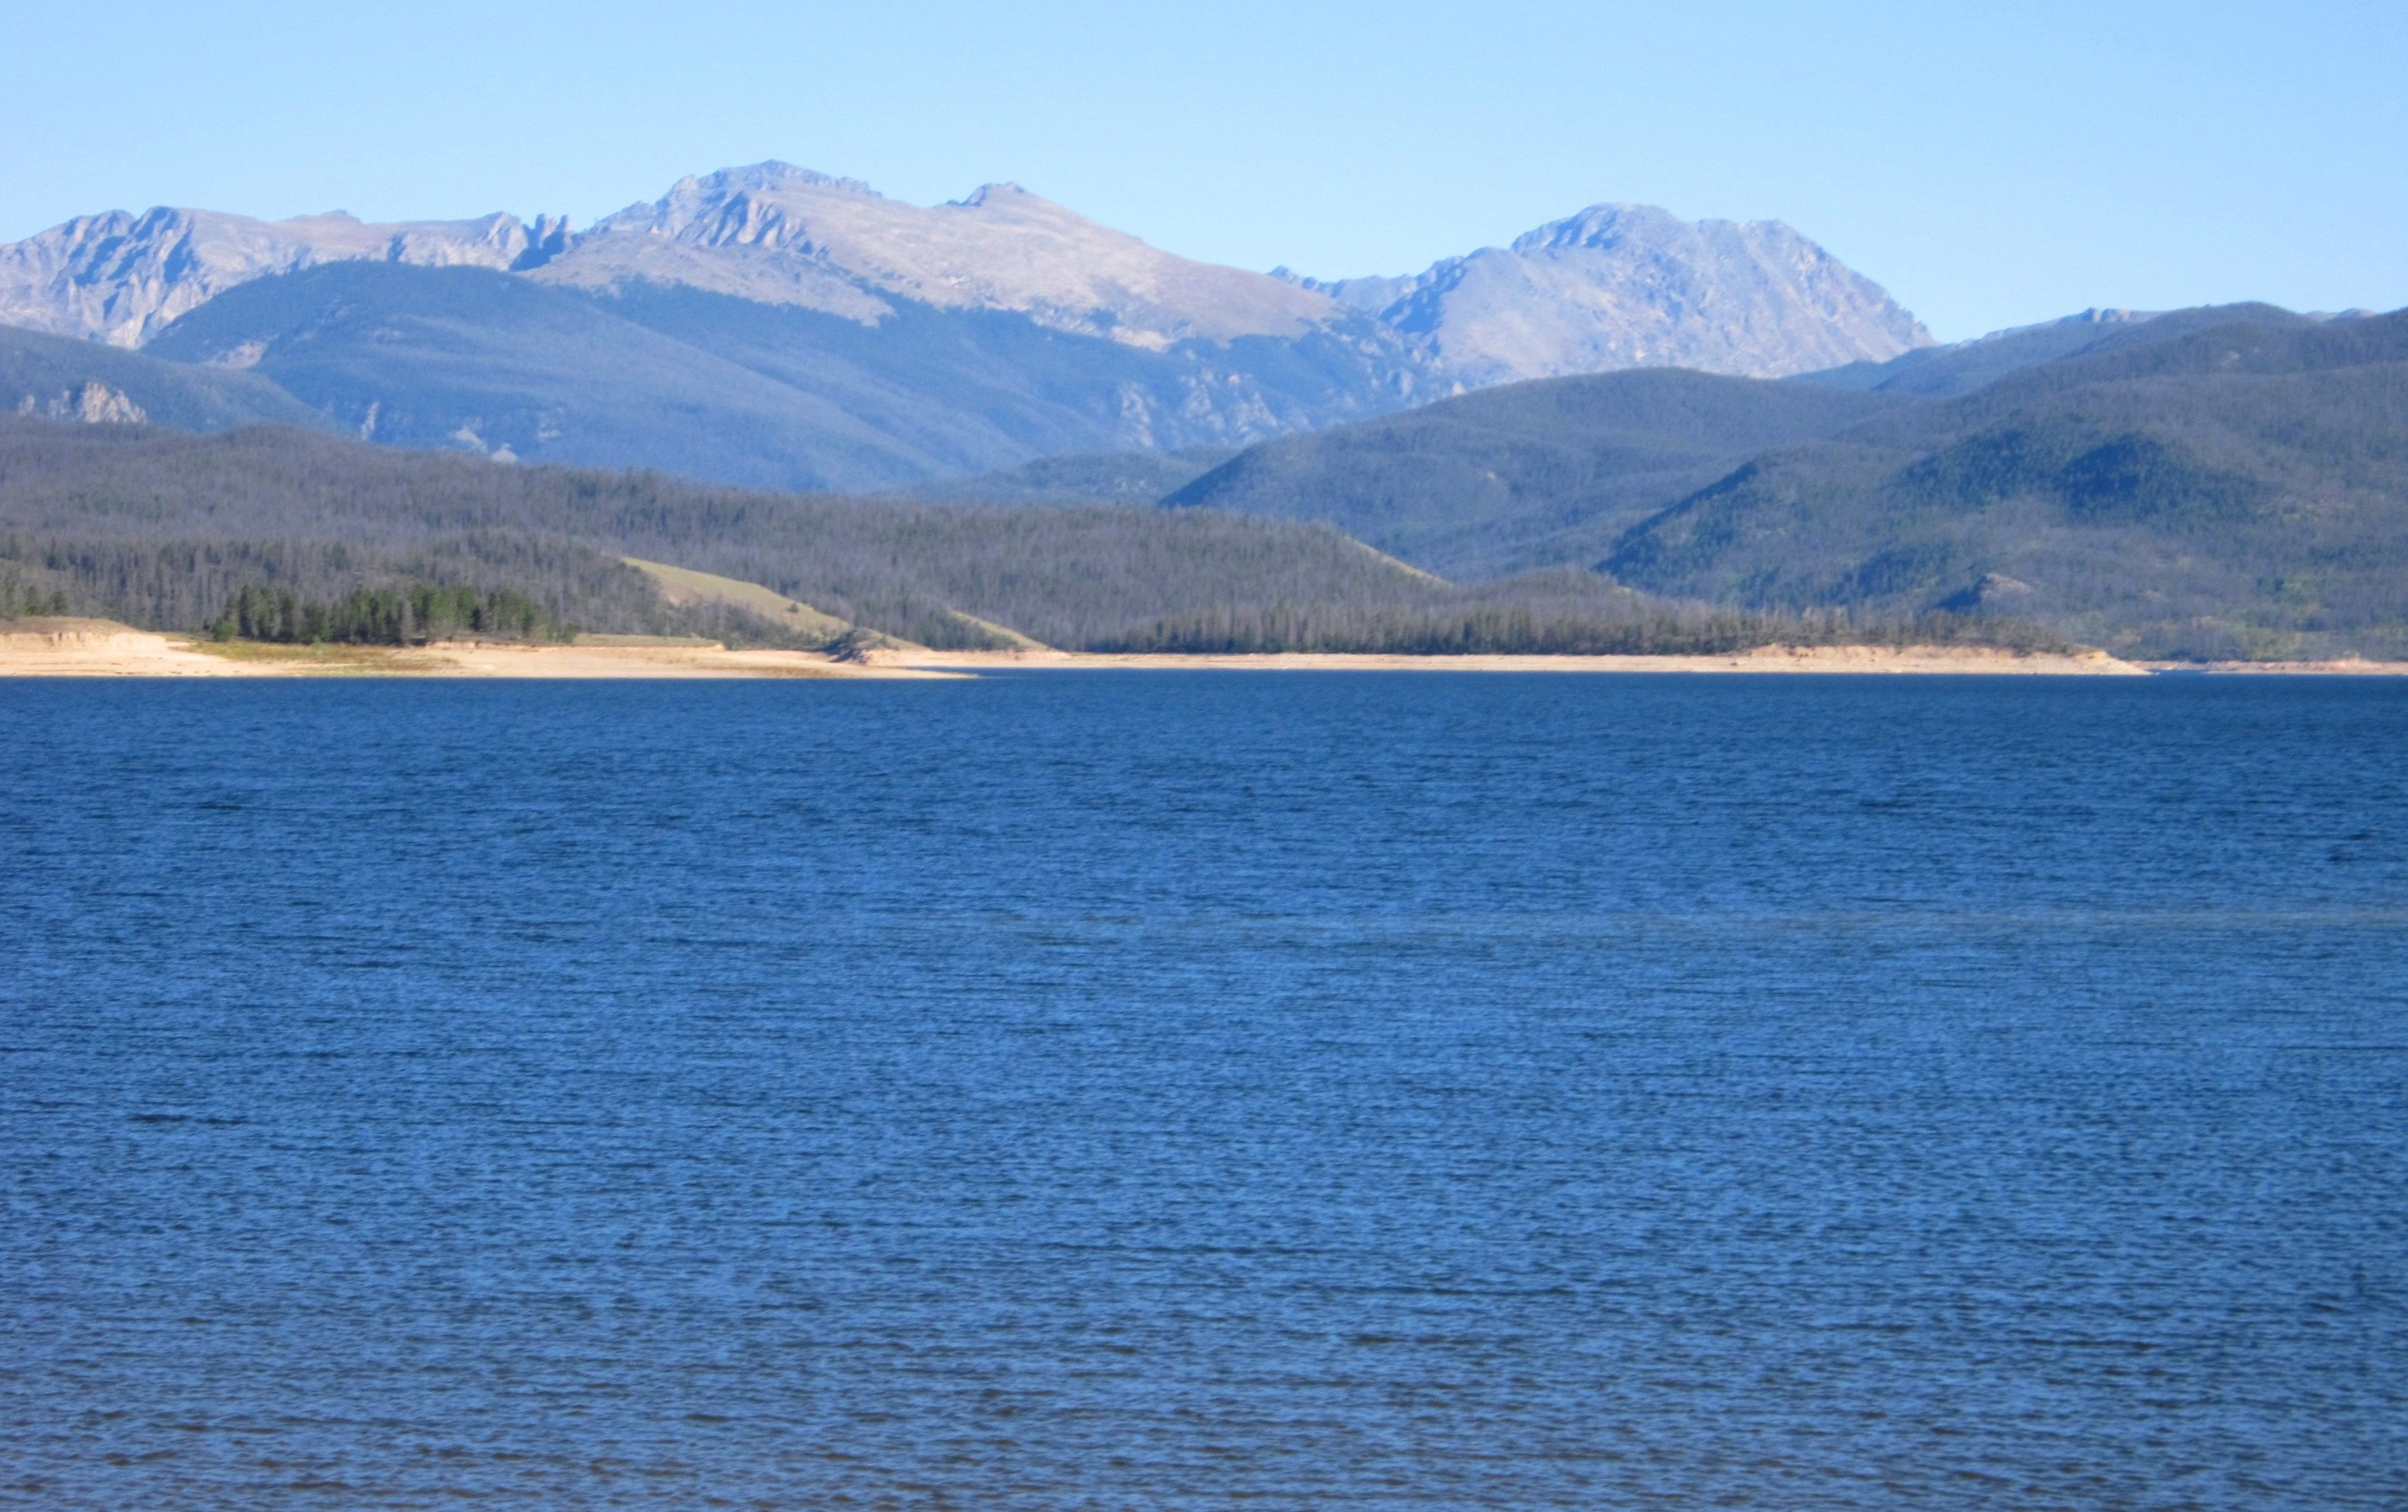 Lake granby wikiwand for Lake granby fishing report